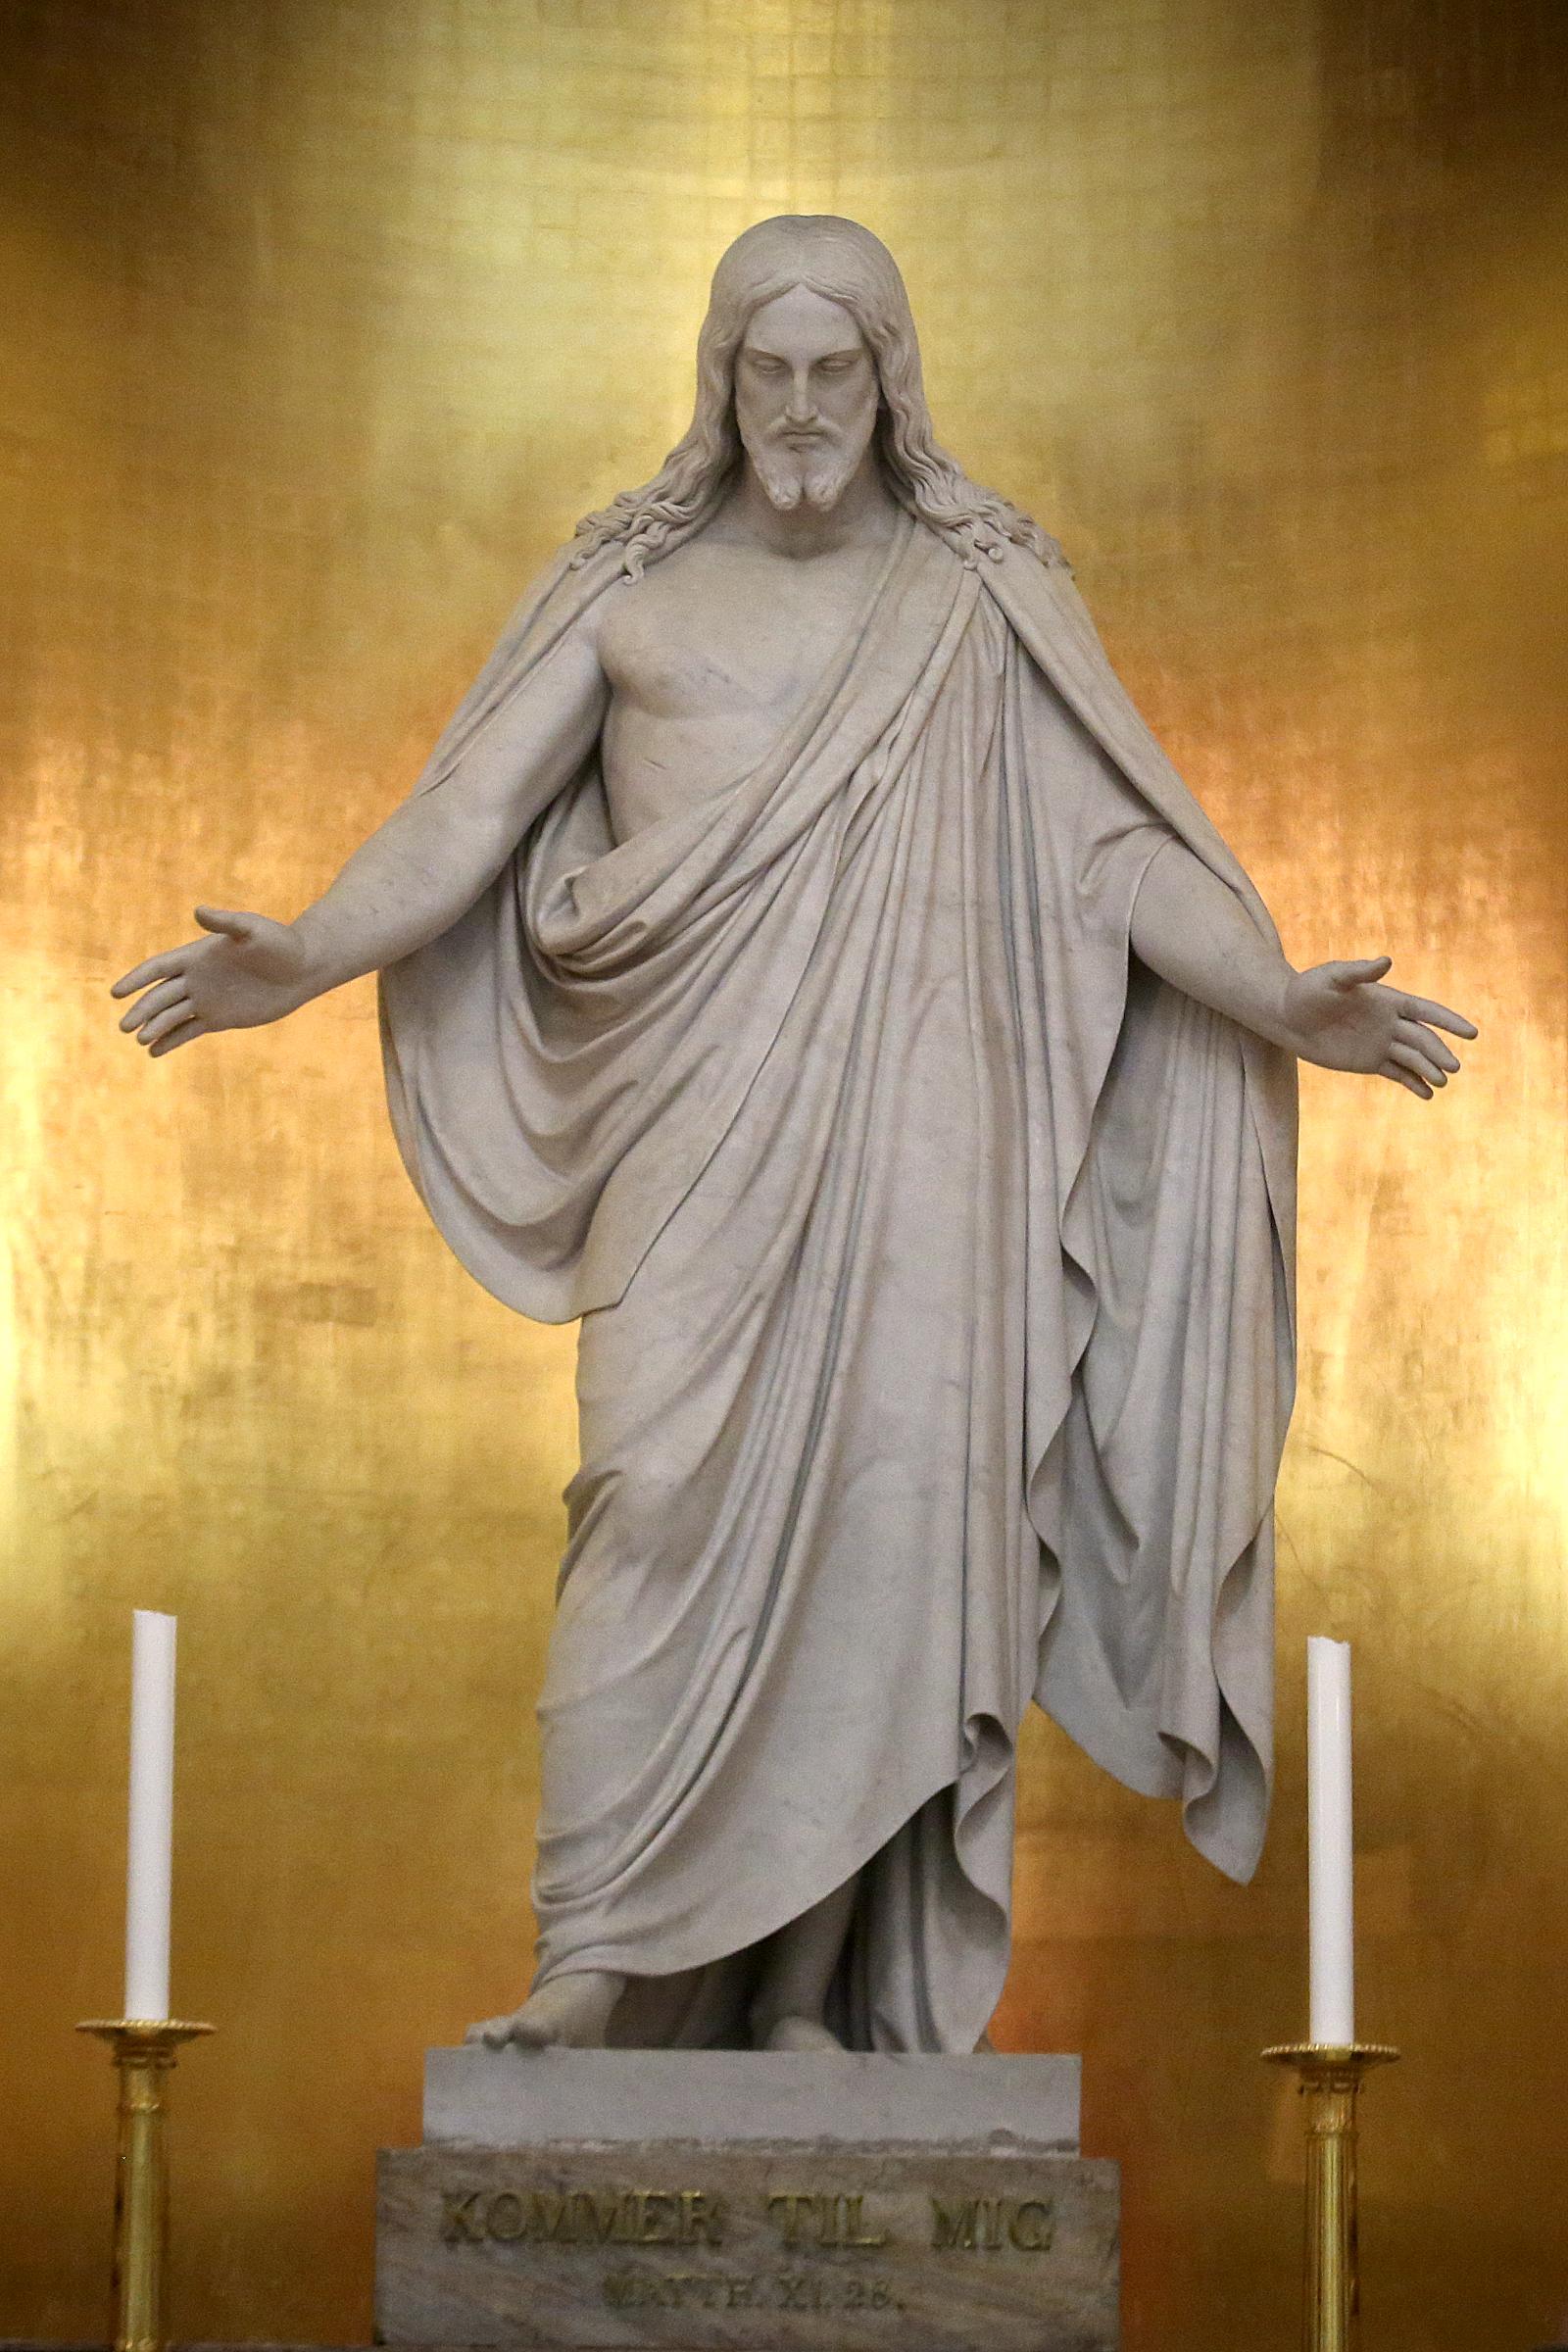 Bertel Thorvaldsen's original Christus statue is in the Church of Our Lady in Copenhagen, Denmark, on Tuesday, Nov. 13, 2018.